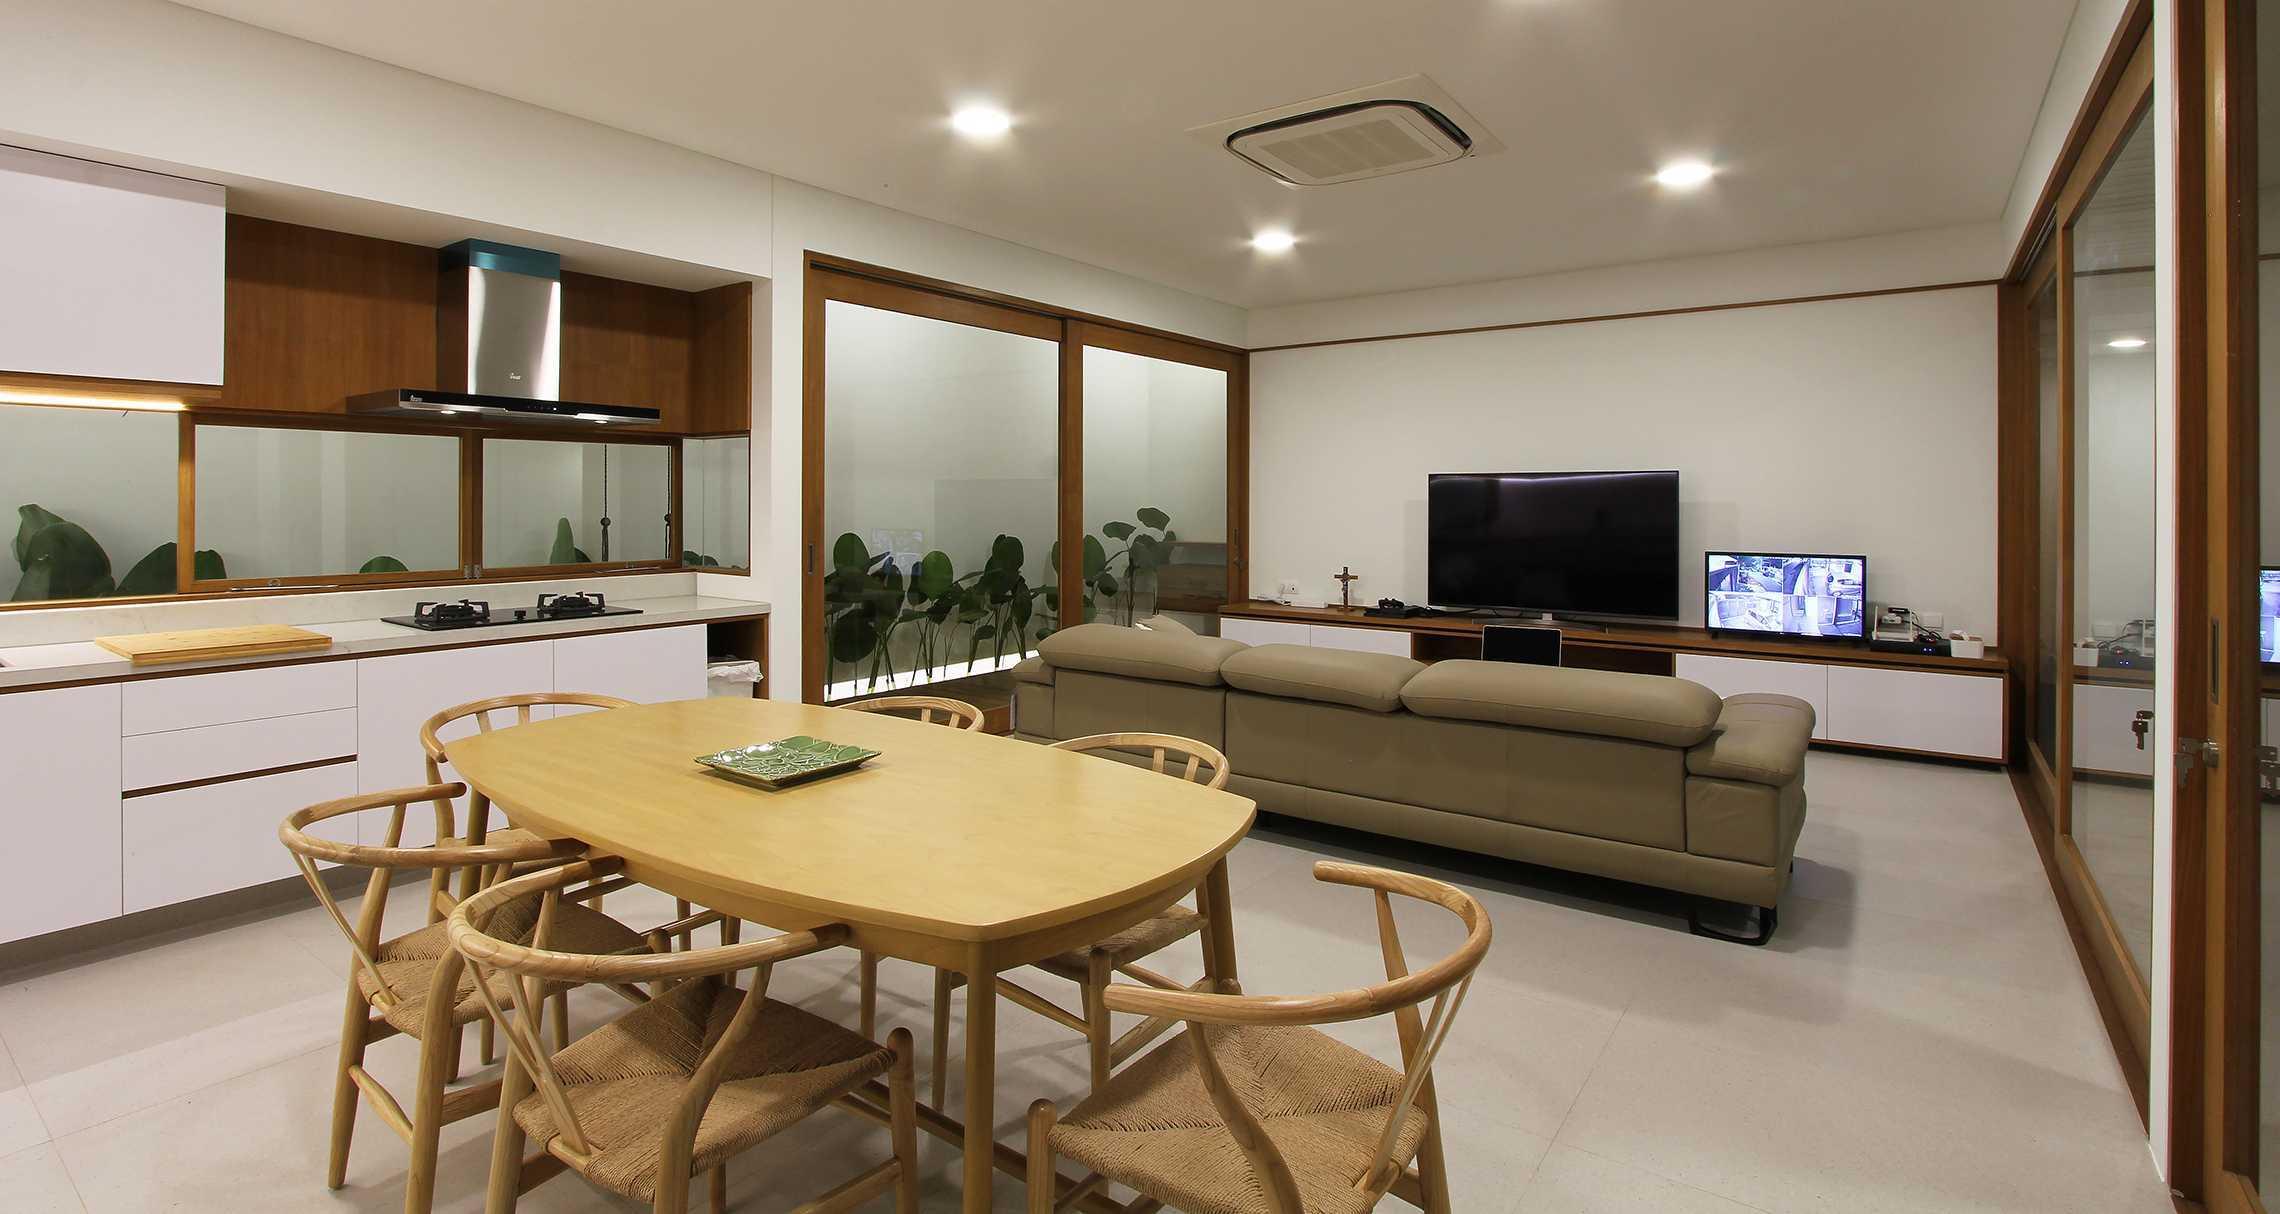 Sasmita Design Studio Penguin House Bandung, Kota Bandung, Jawa Barat, Indonesia Bandung, Kota Bandung, Jawa Barat, Indonesia William-Sasmita-Penguin-House   91200